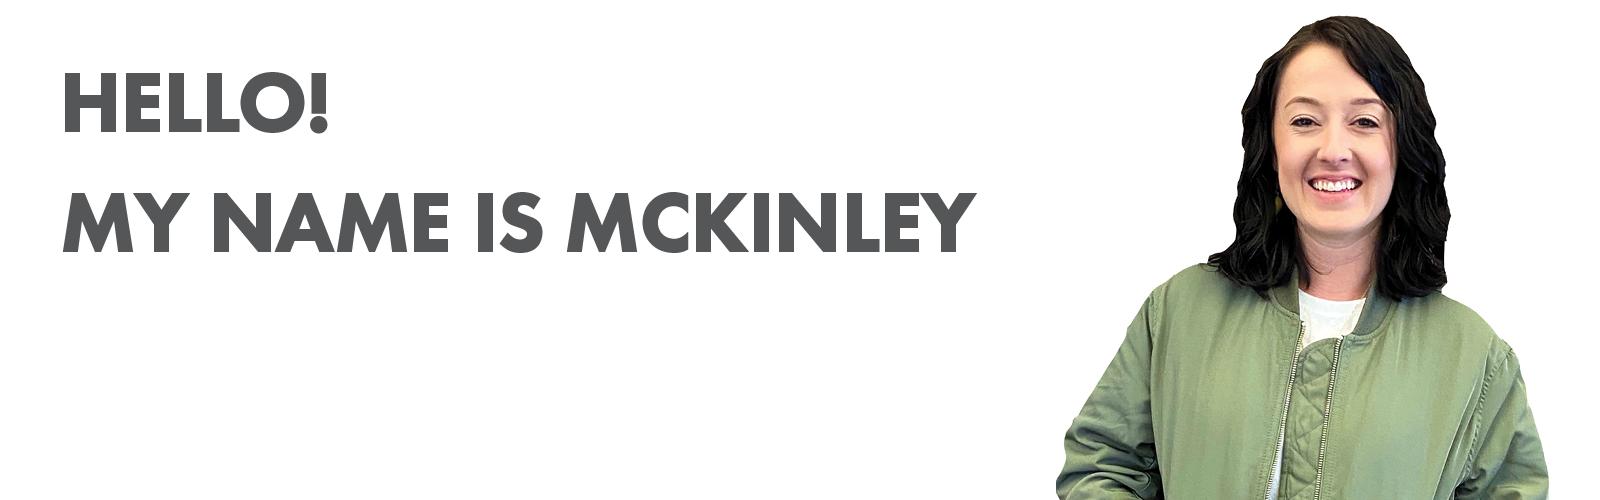 meet mckinley | designer at fbc remodel